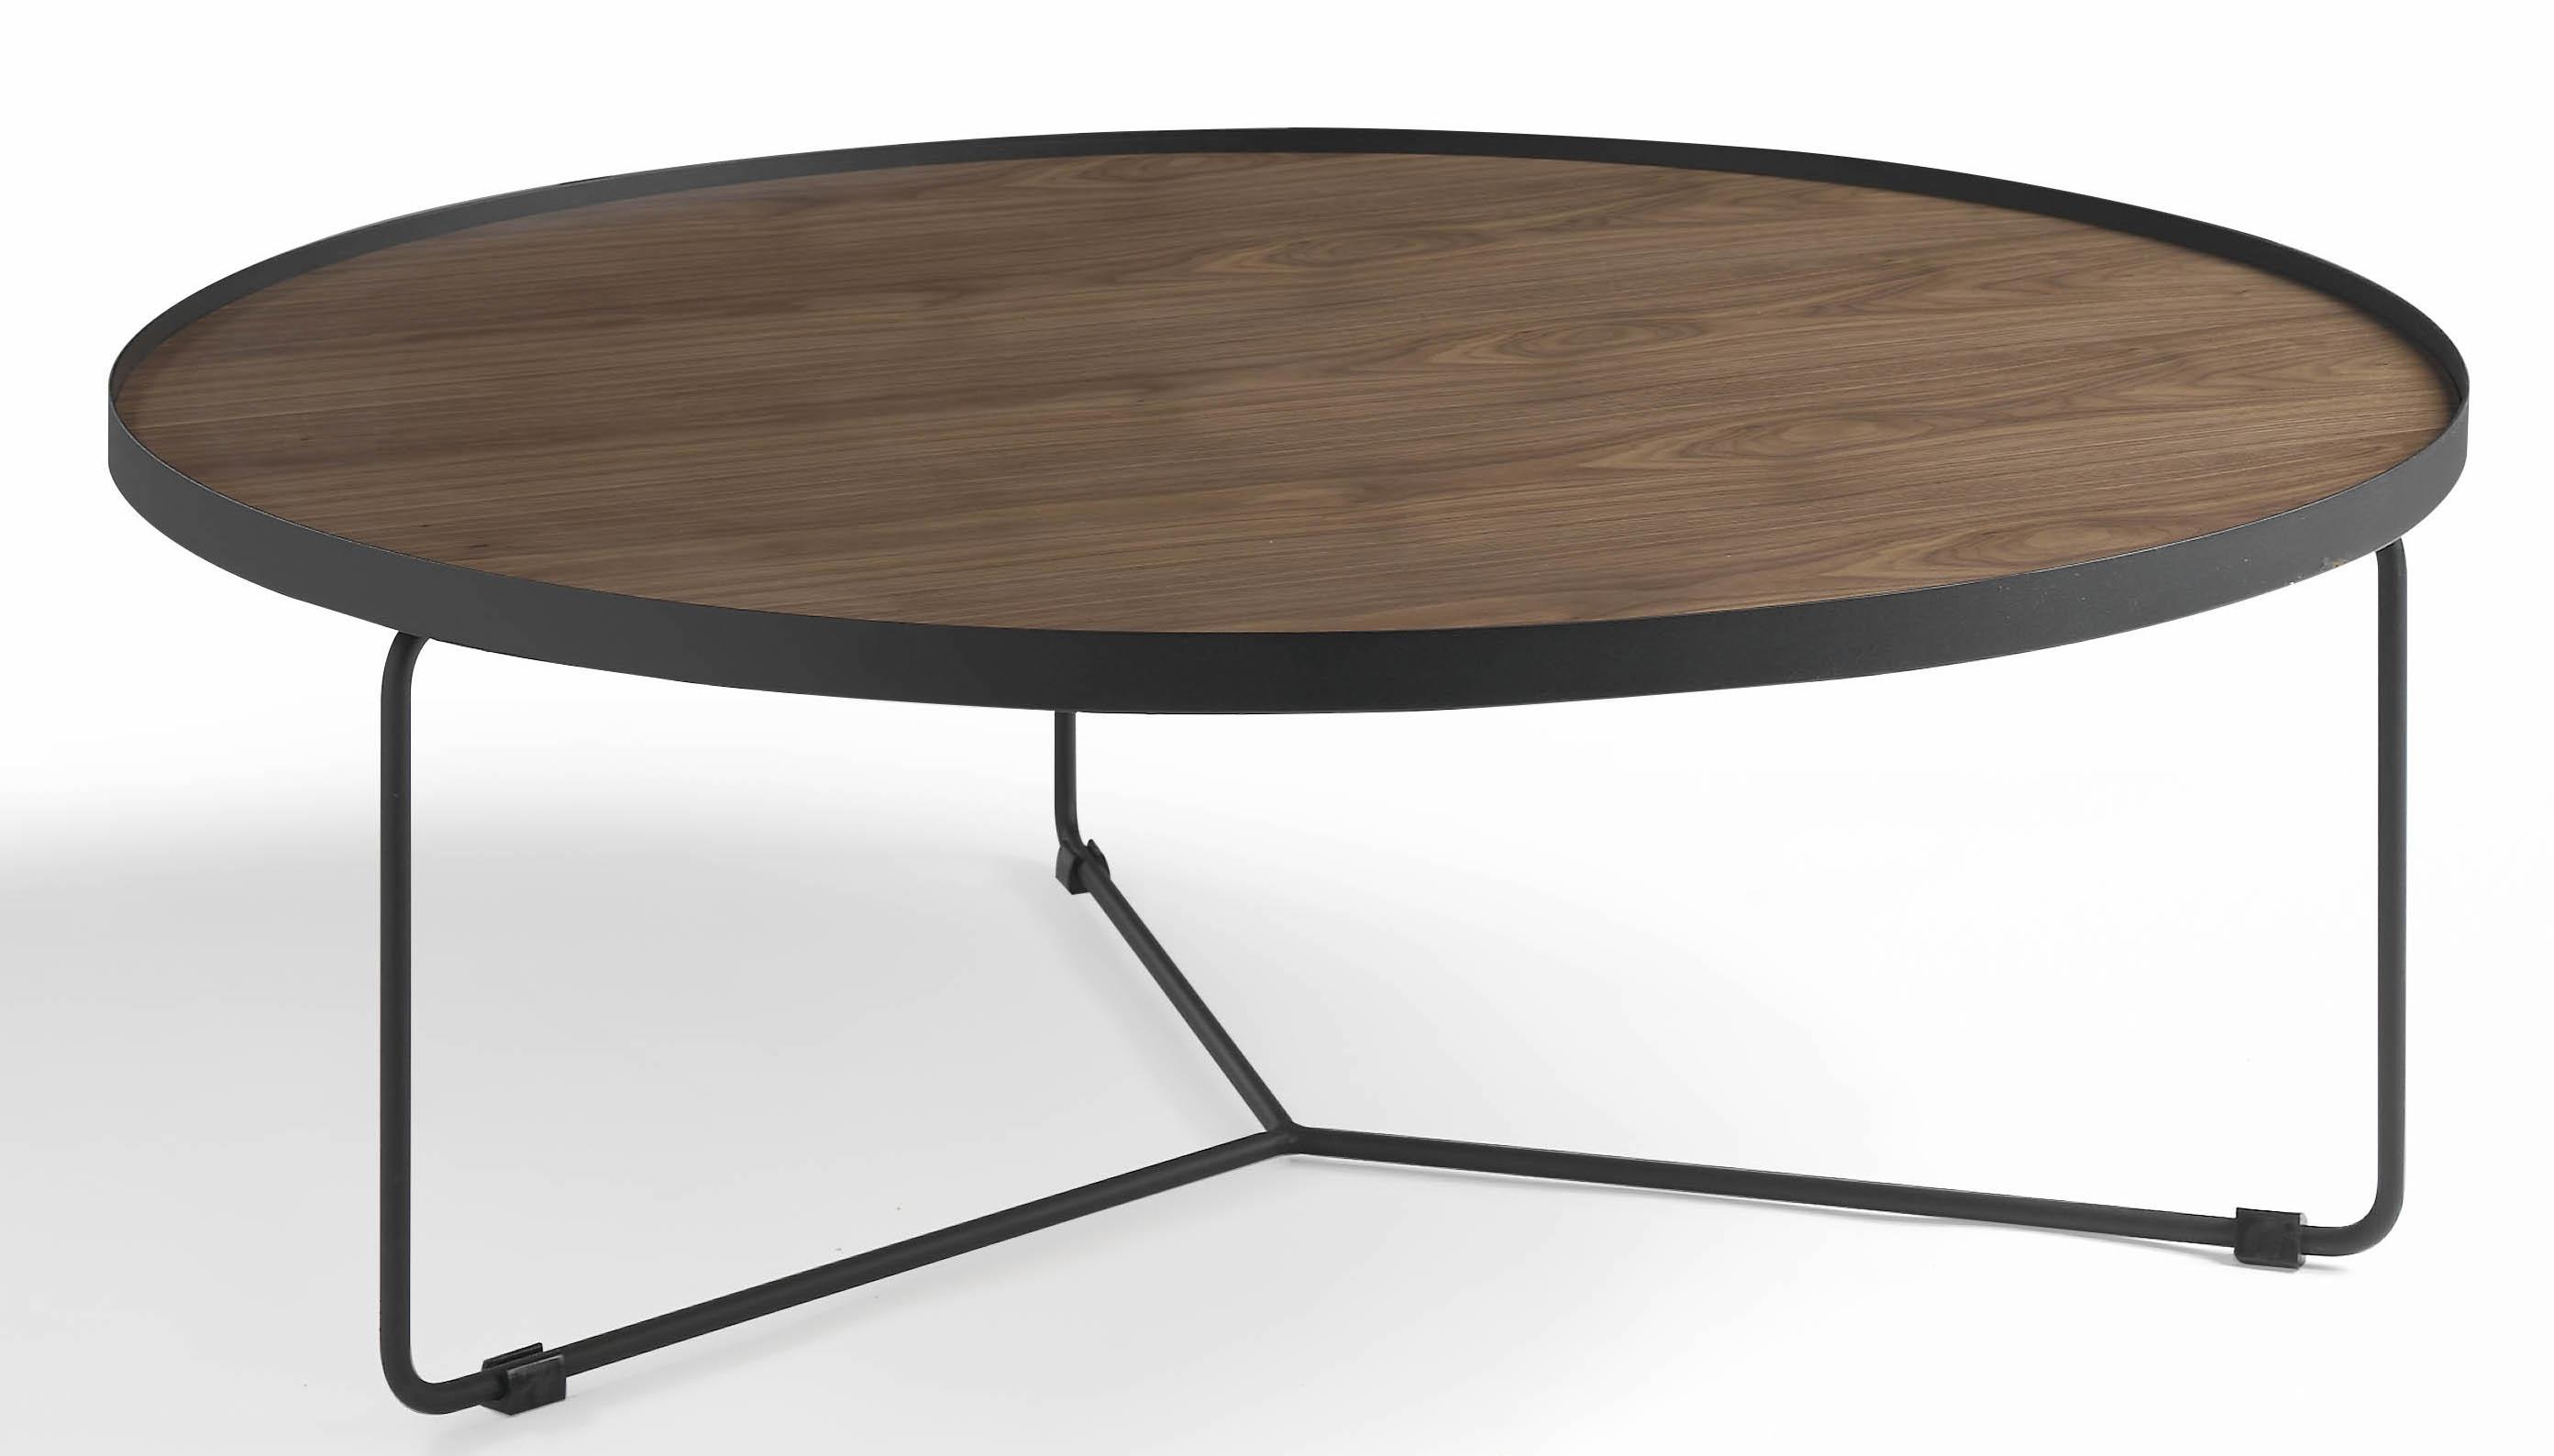 Angel cerda table basse ronde bois plaqu noyer et m tal Table basse metal noir